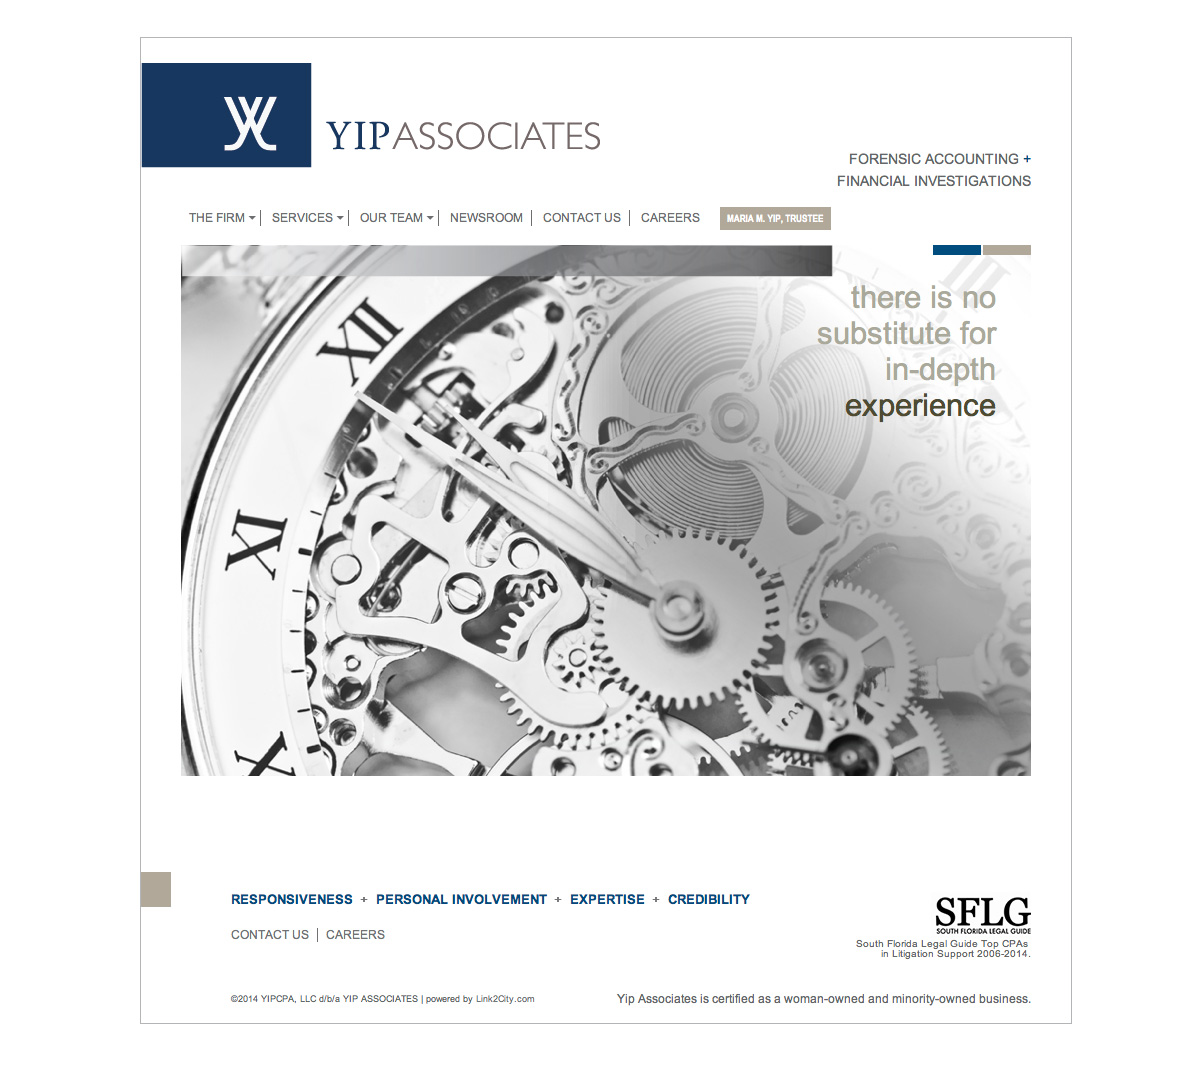 website and logo design hero image